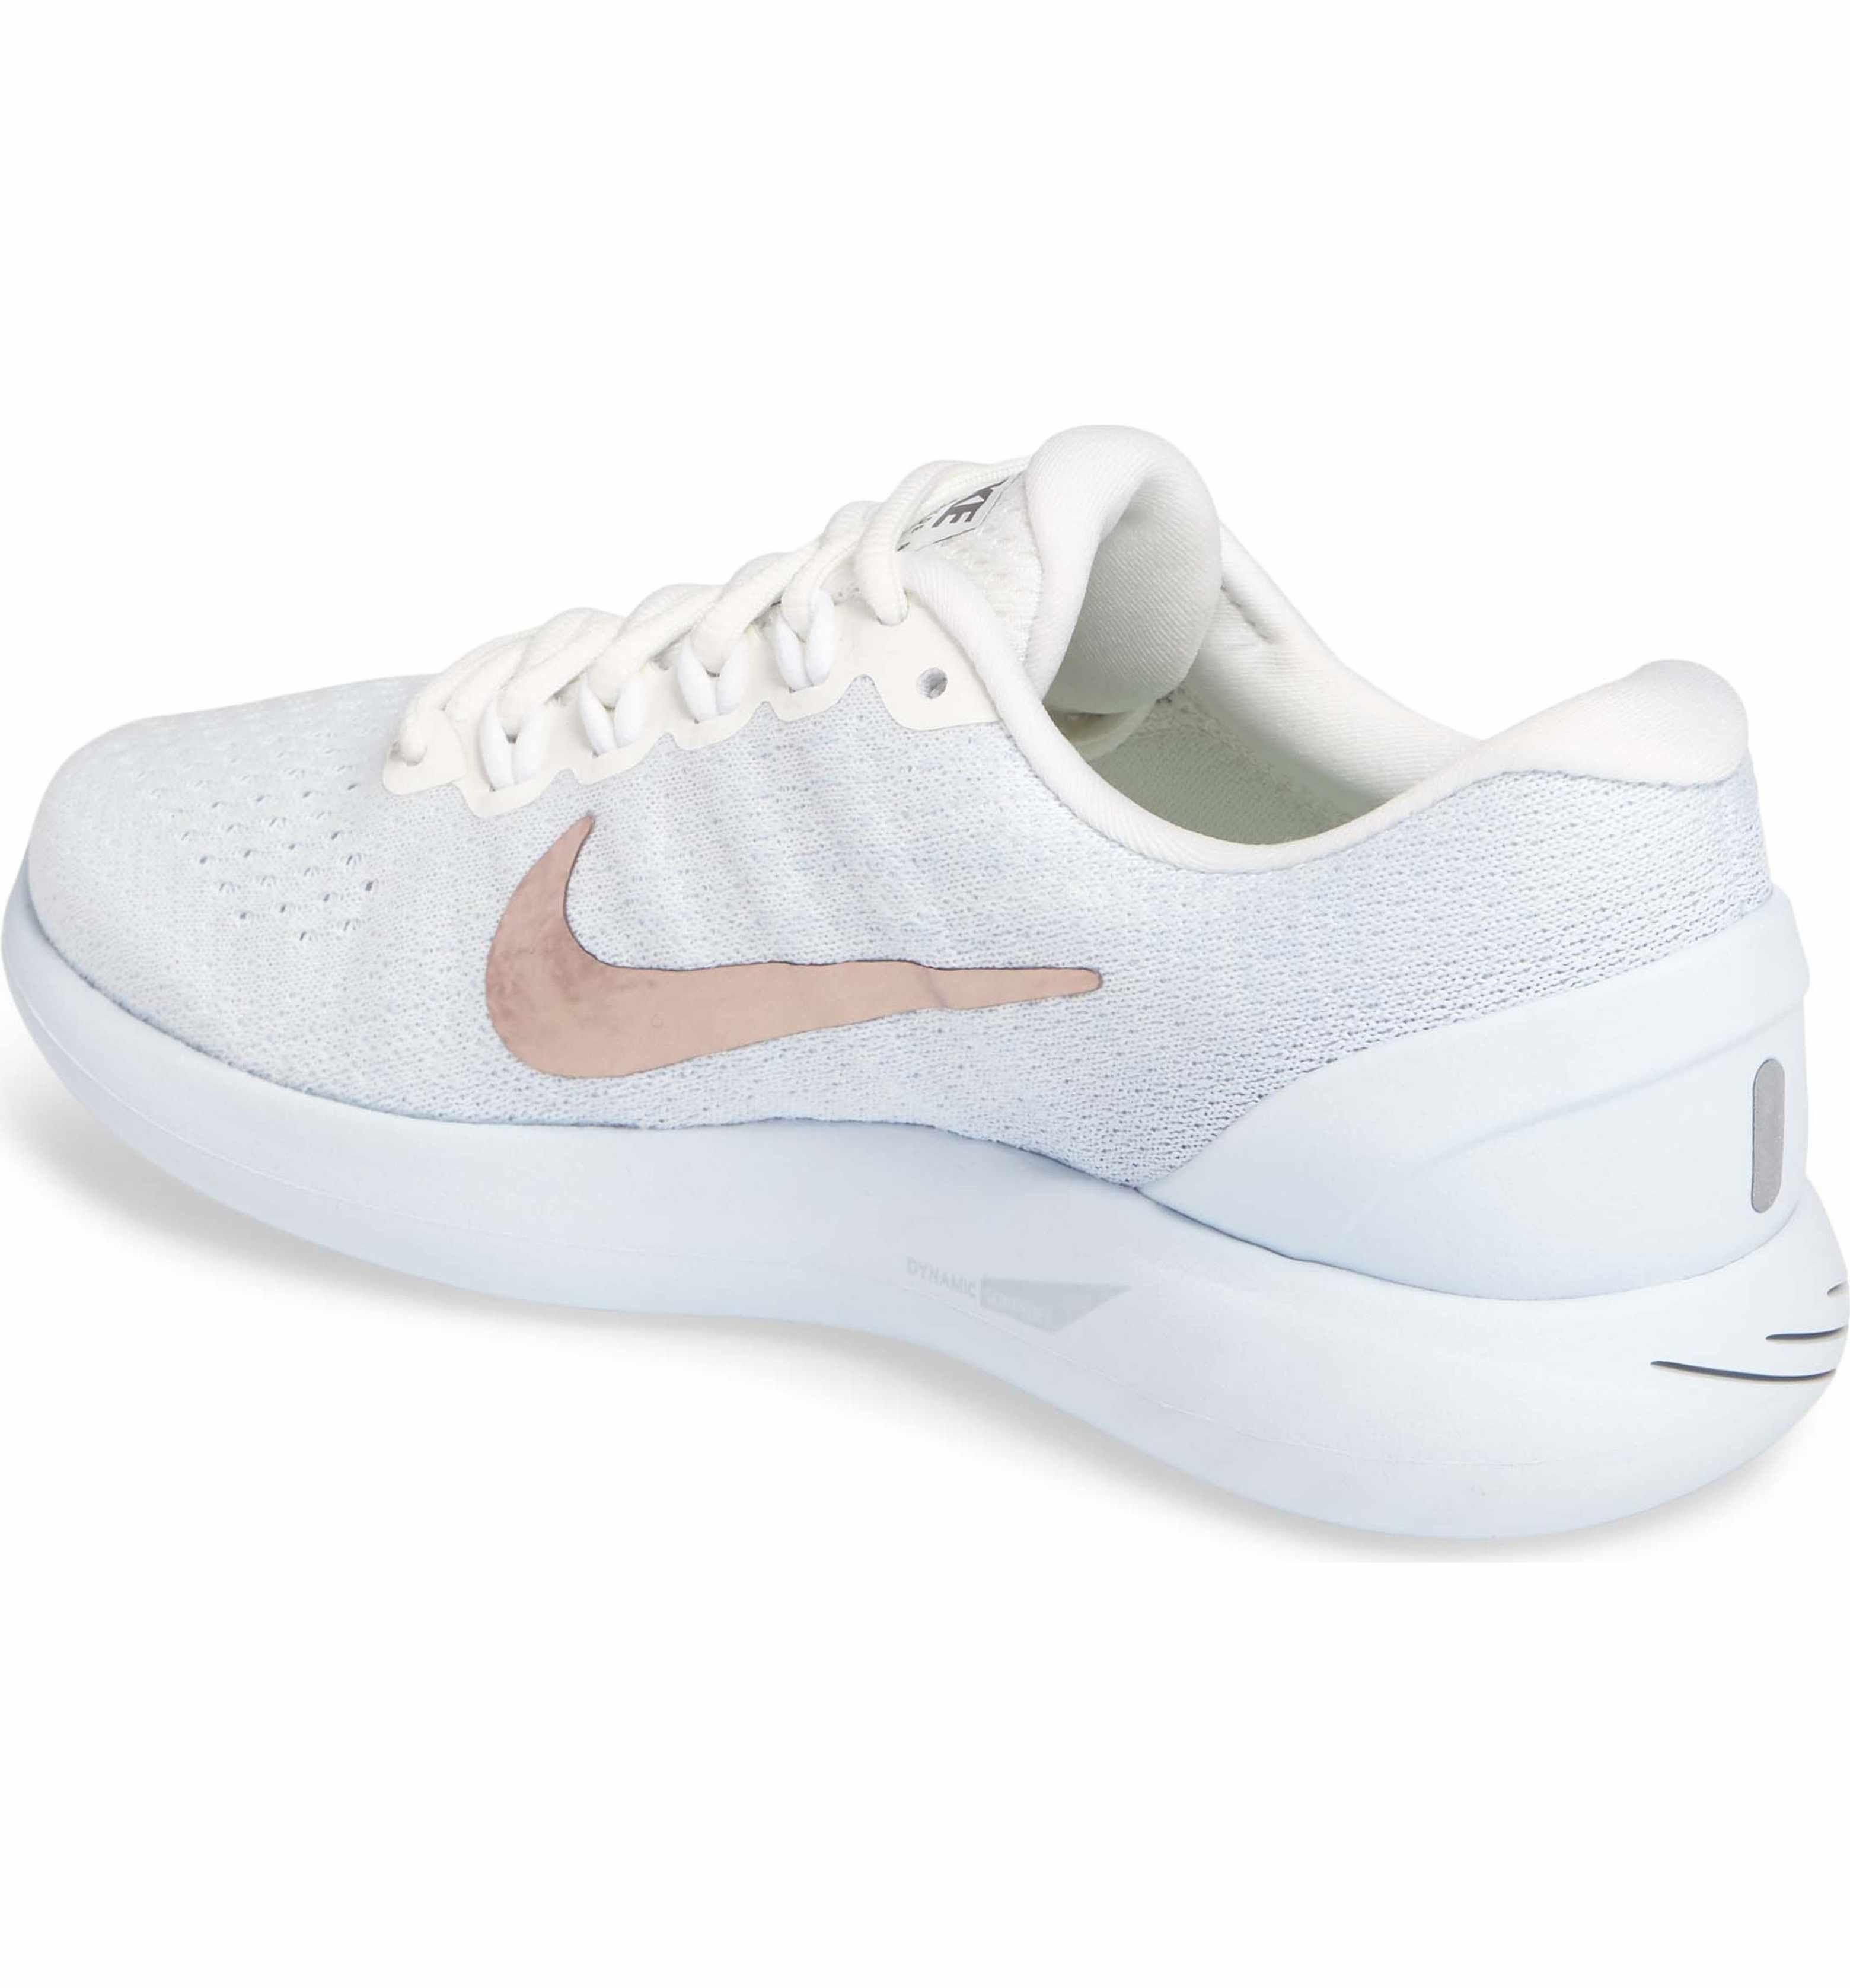 reputable site 3f6ae a3f32 Main Image - Nike LunarGlide 9 X-Plore Running Shoe (Women)